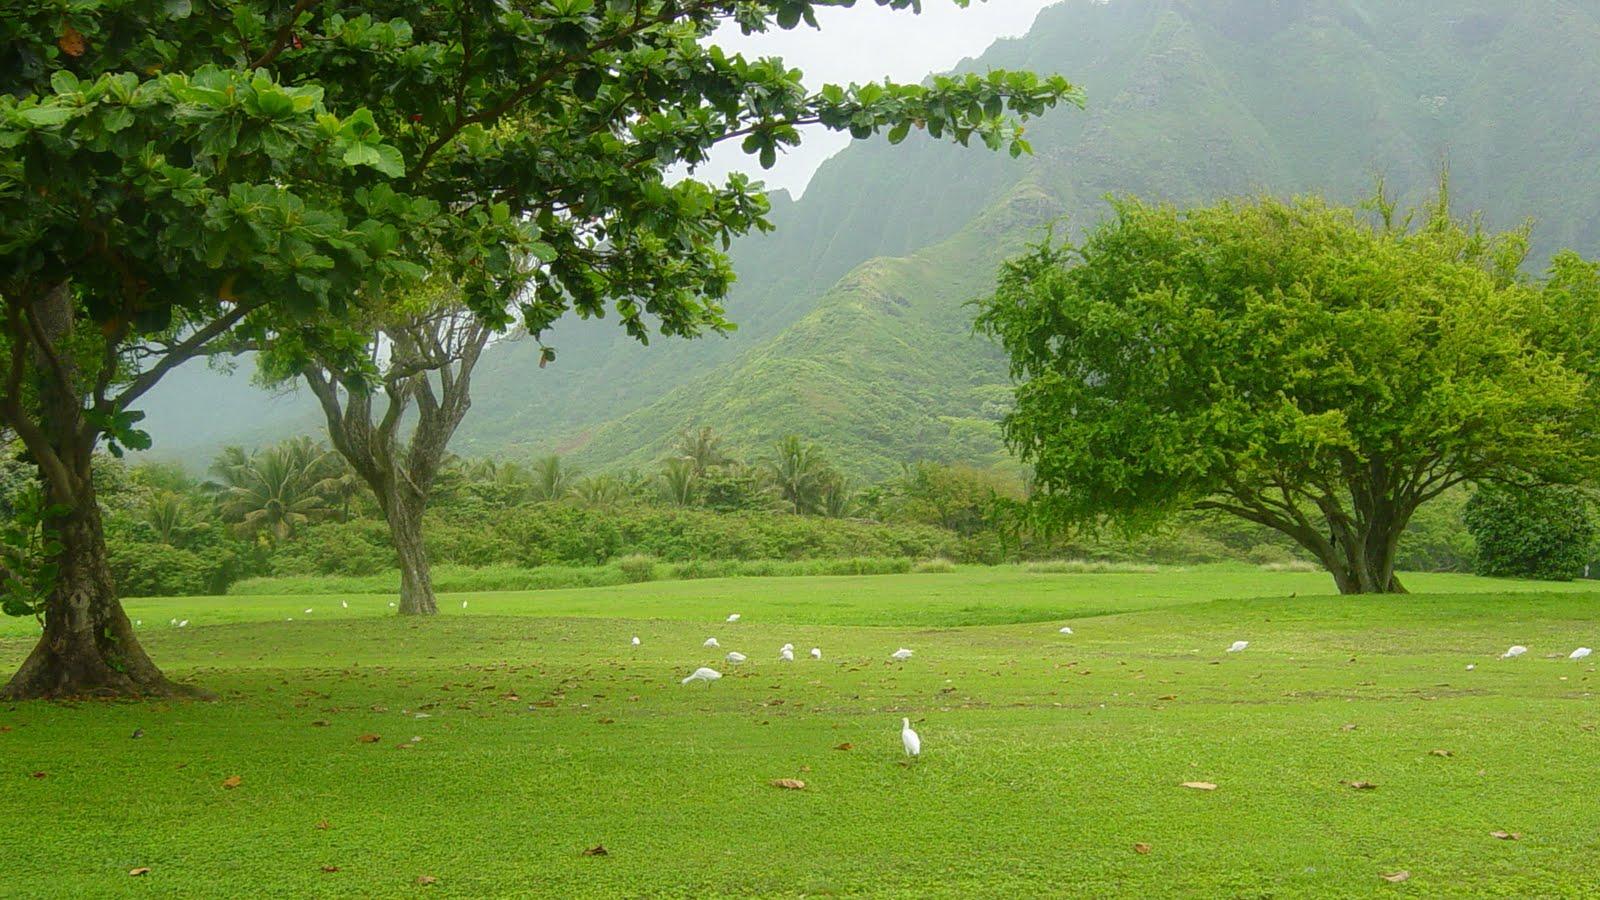 Free Download Jaspreet Rekhi 20 Amazing Nature Full Hd